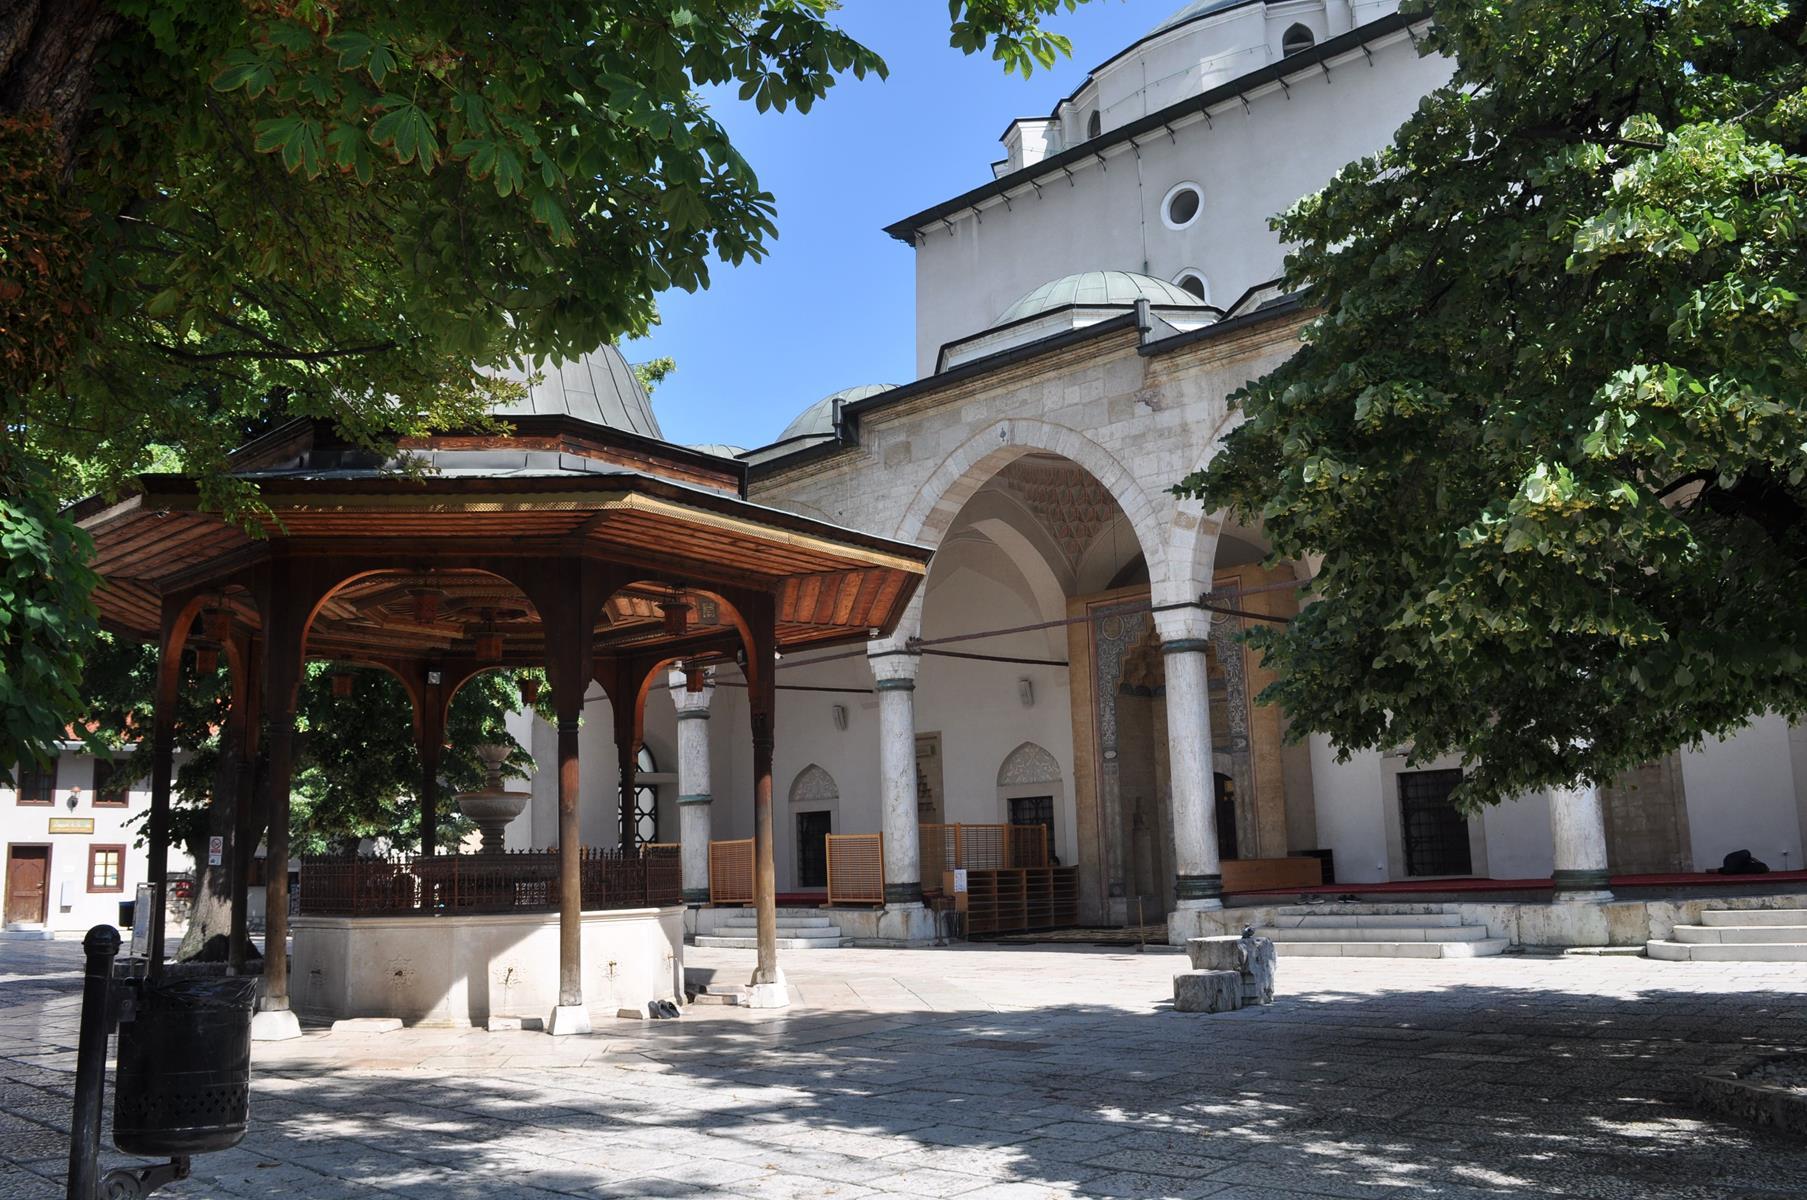 gazi husrev bey mosque, mosque, bosnia and herzegovina, sarajevo, tours in sarajevo, tours in balkan, travel